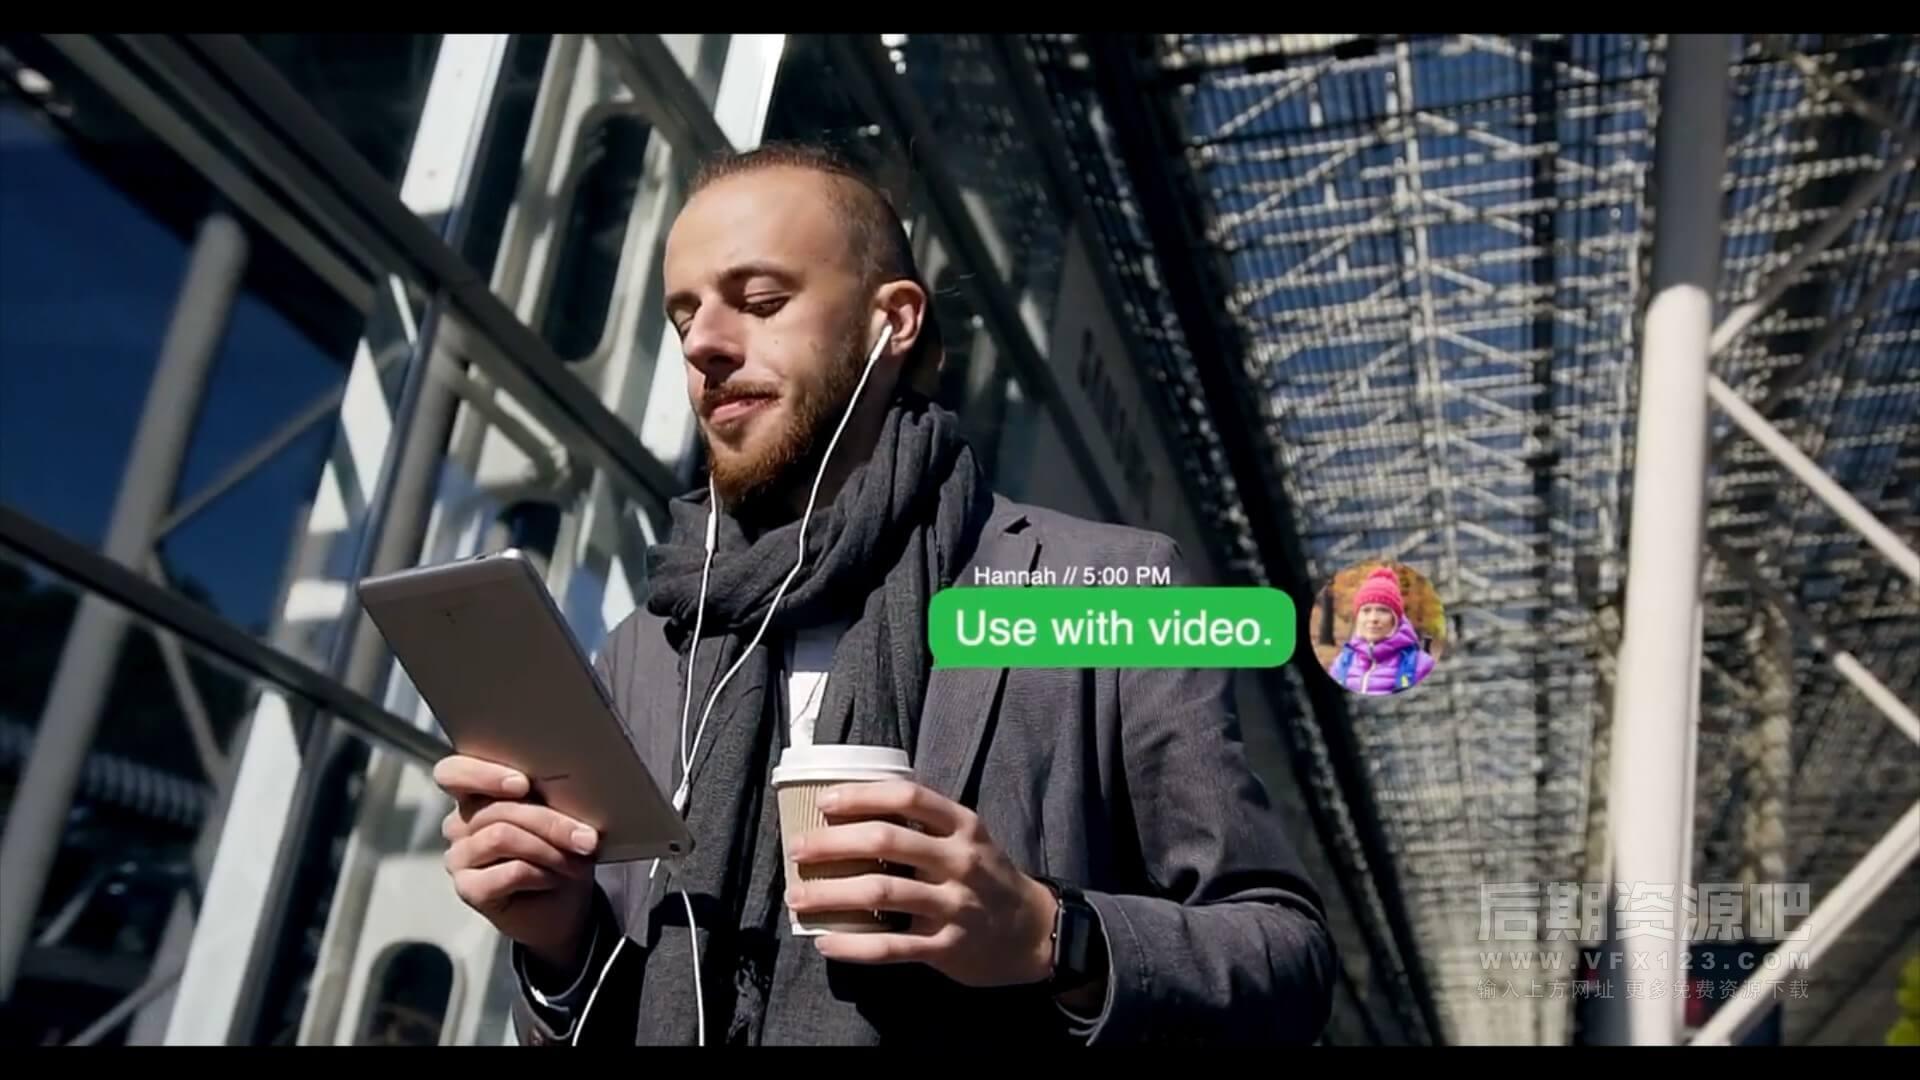 fcpx插件 8种社交聊天对话框带头像气泡弹窗样式 Text Messaging